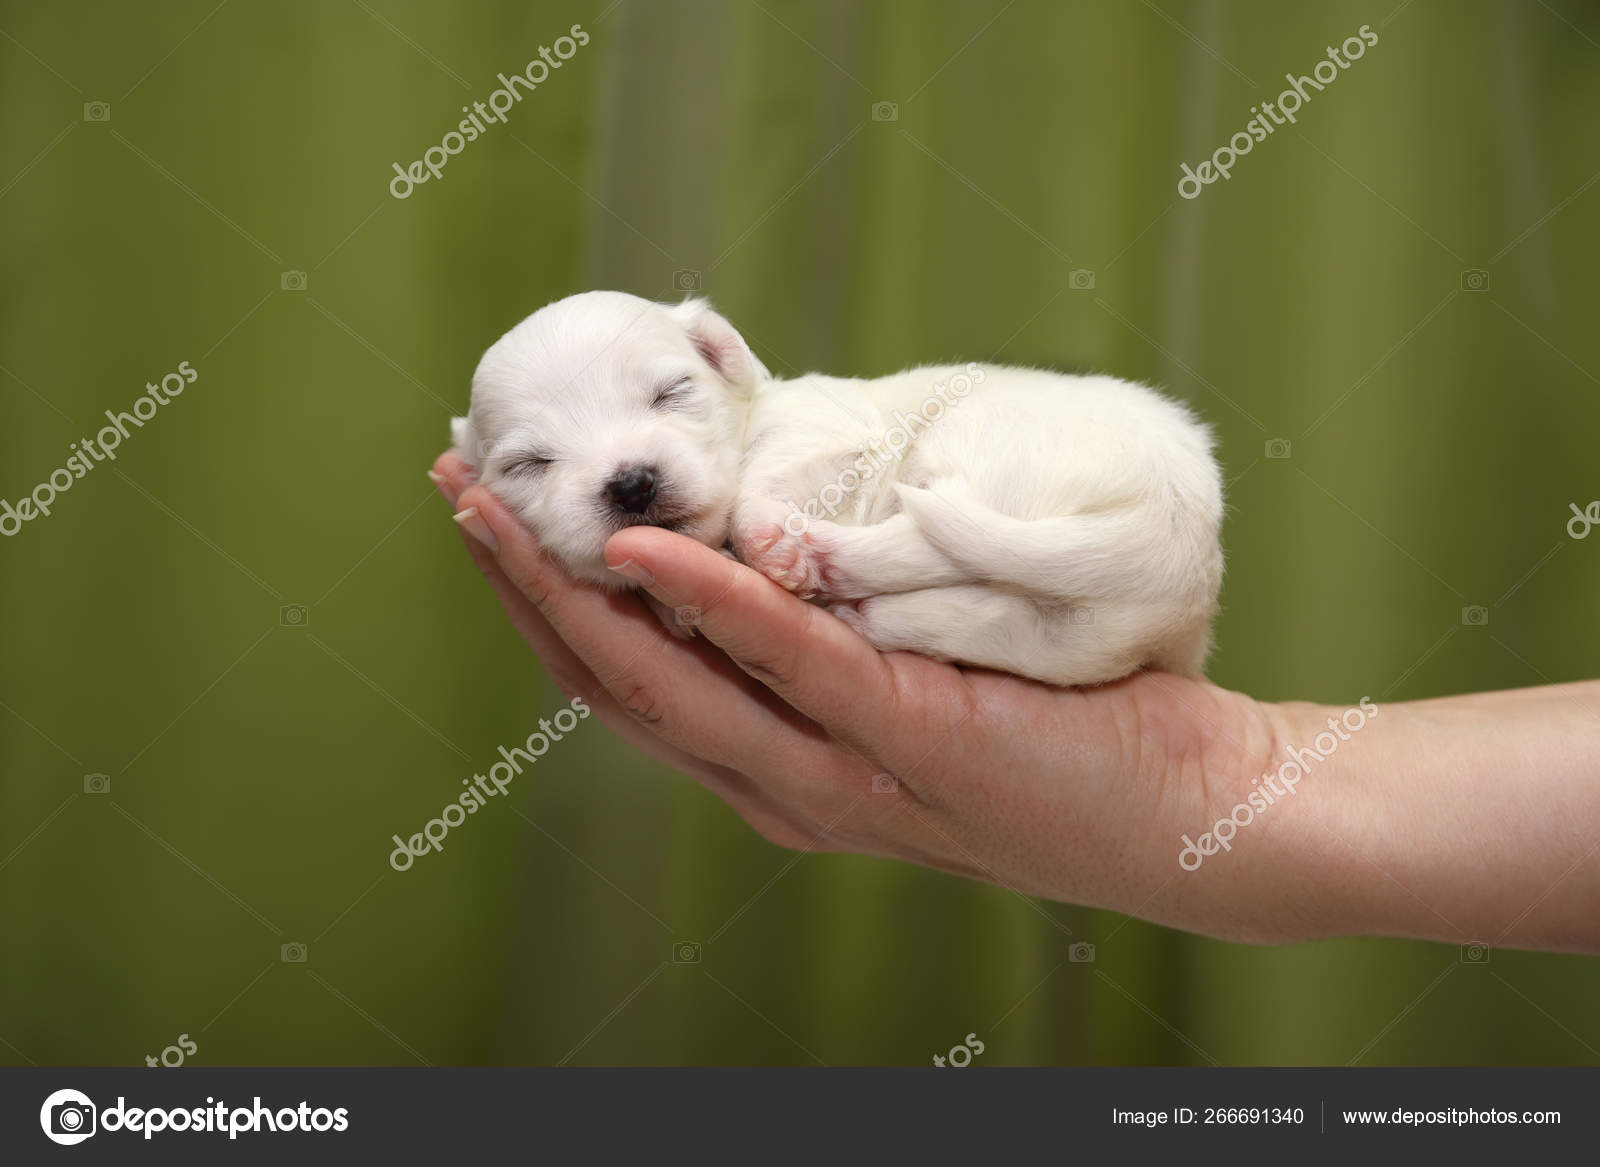 Cute Maltese Puppy One Month Old Sleeping Woman Palm Green Stock Photo C Likstudio 266691340